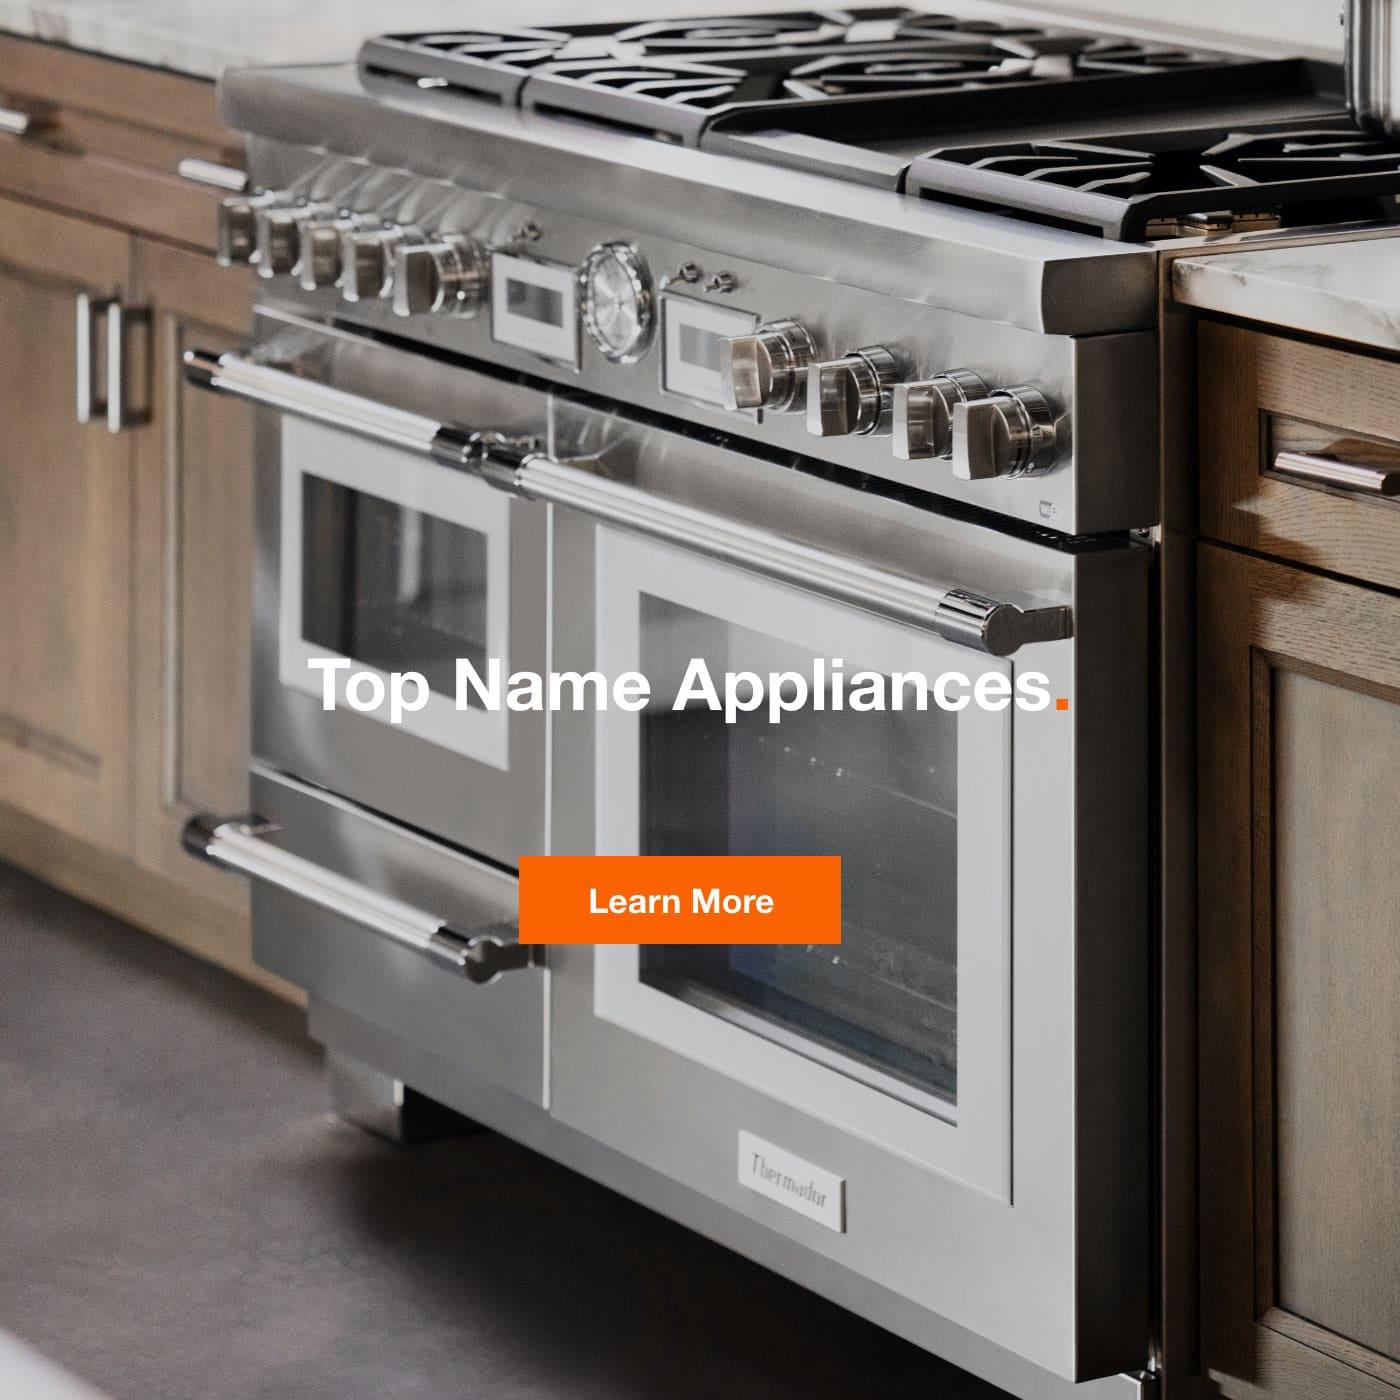 Top Name Appliances